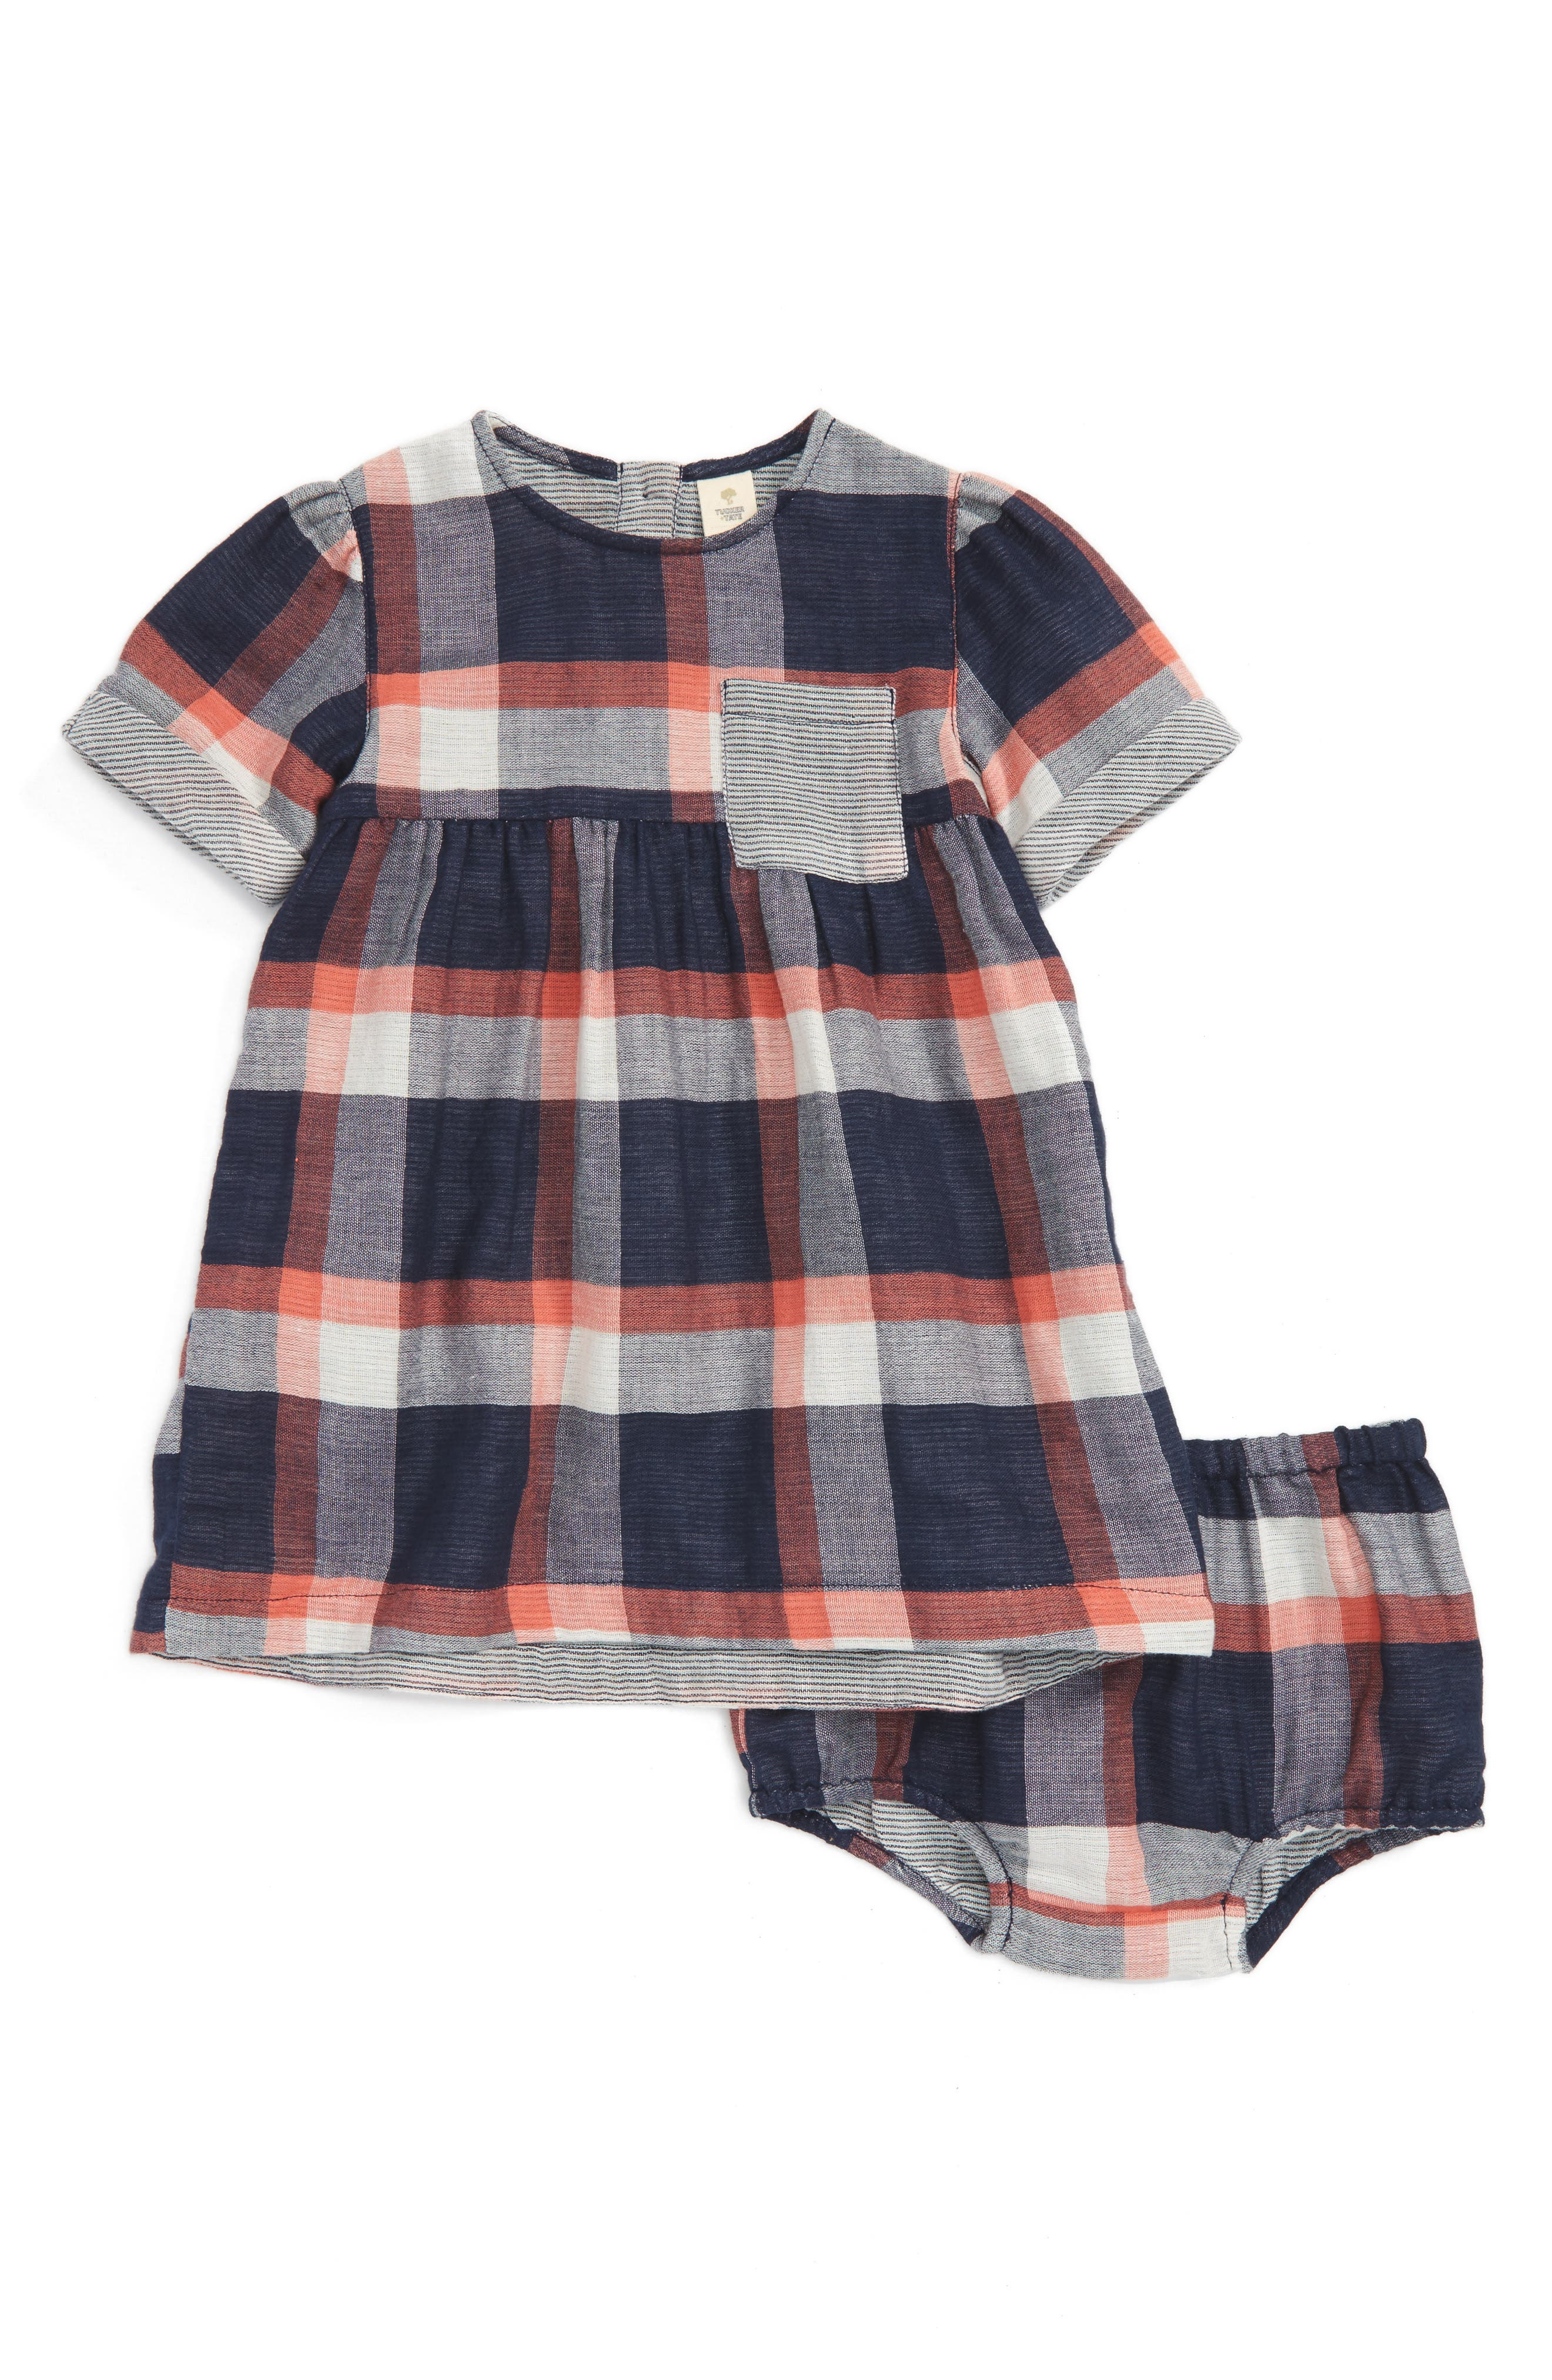 Alternate Image 1 Selected - Tucker + Tate Plaid Short Sleeve Dress (Baby Girls)